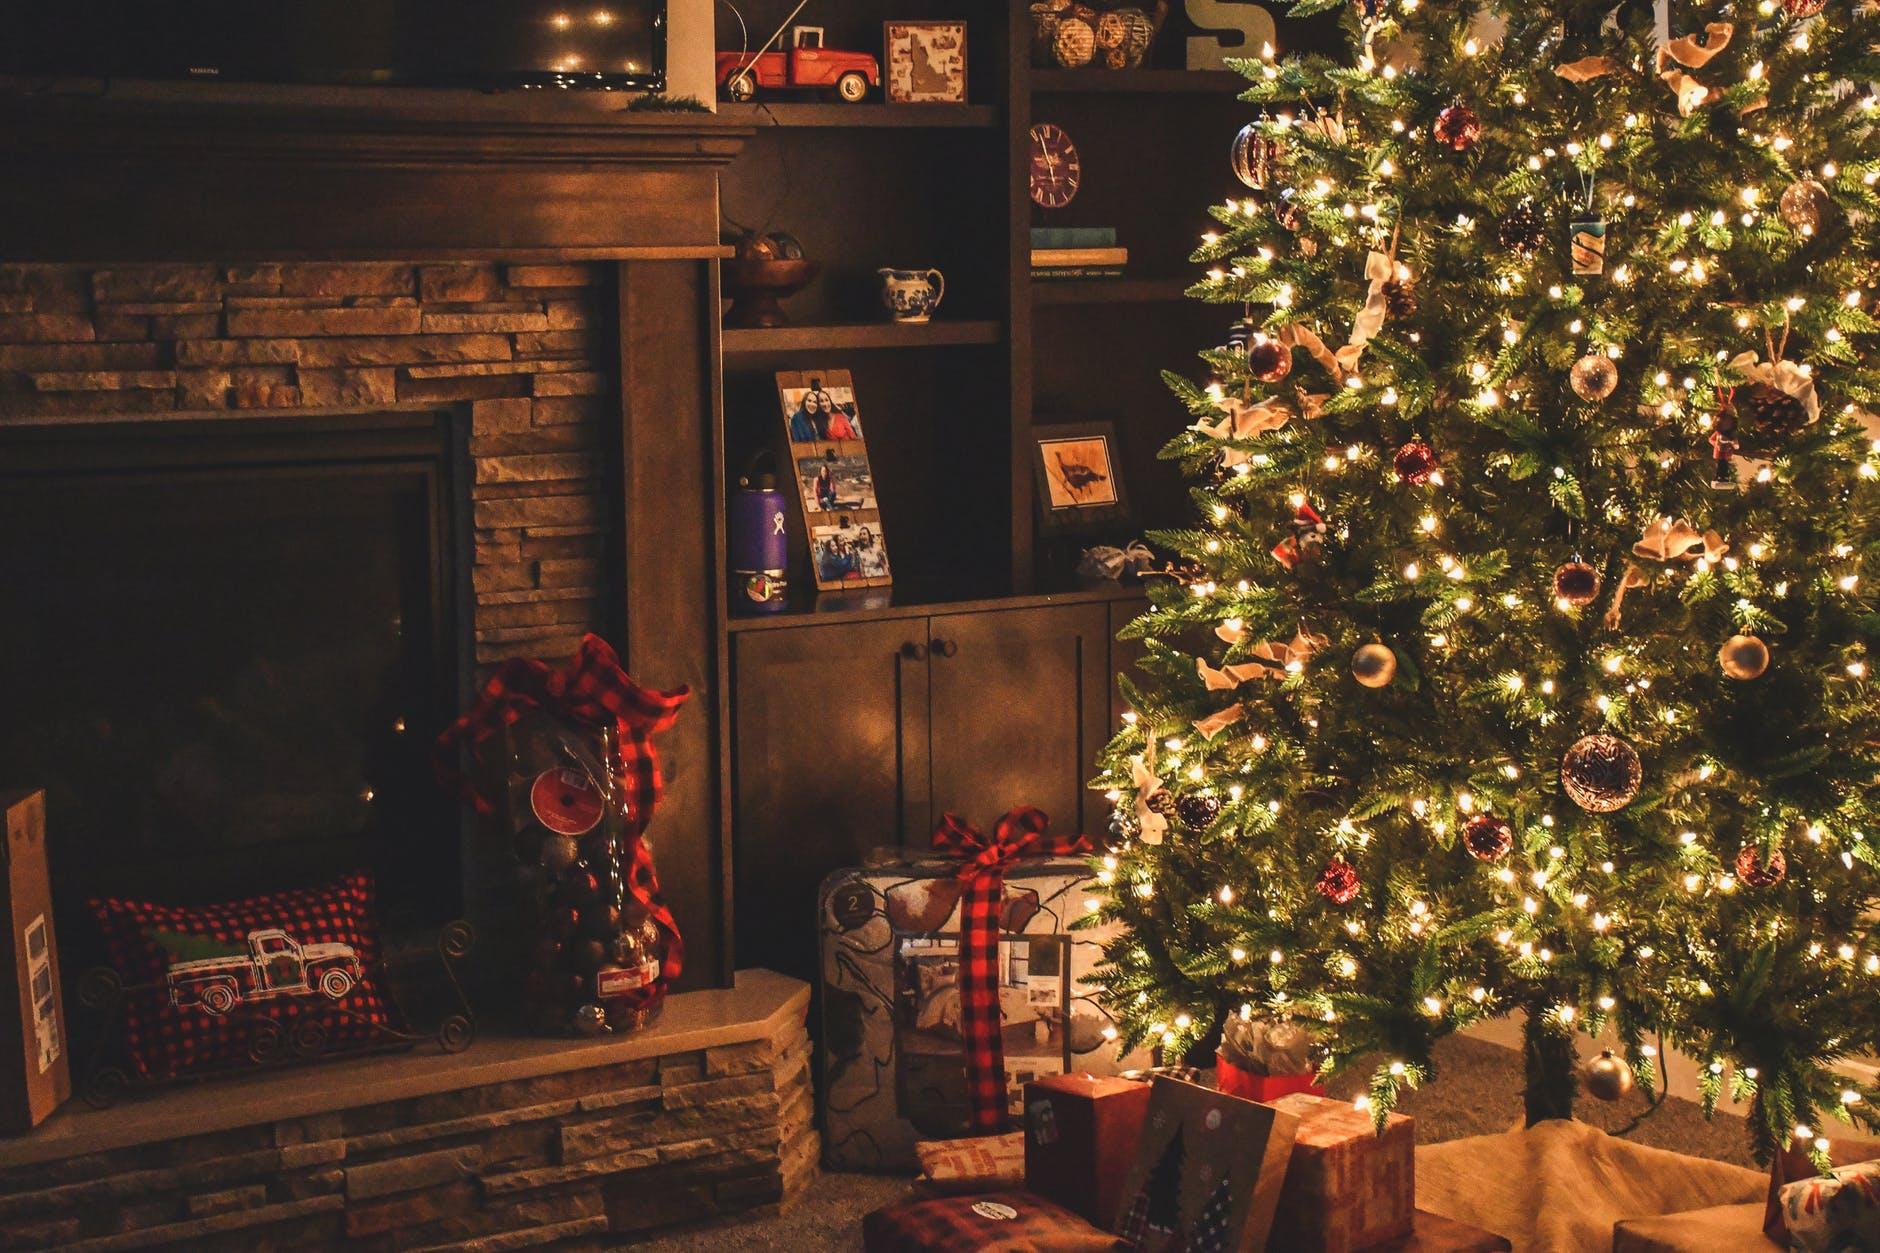 Vive a magia do Natal come estes 25 filmes © Pexels